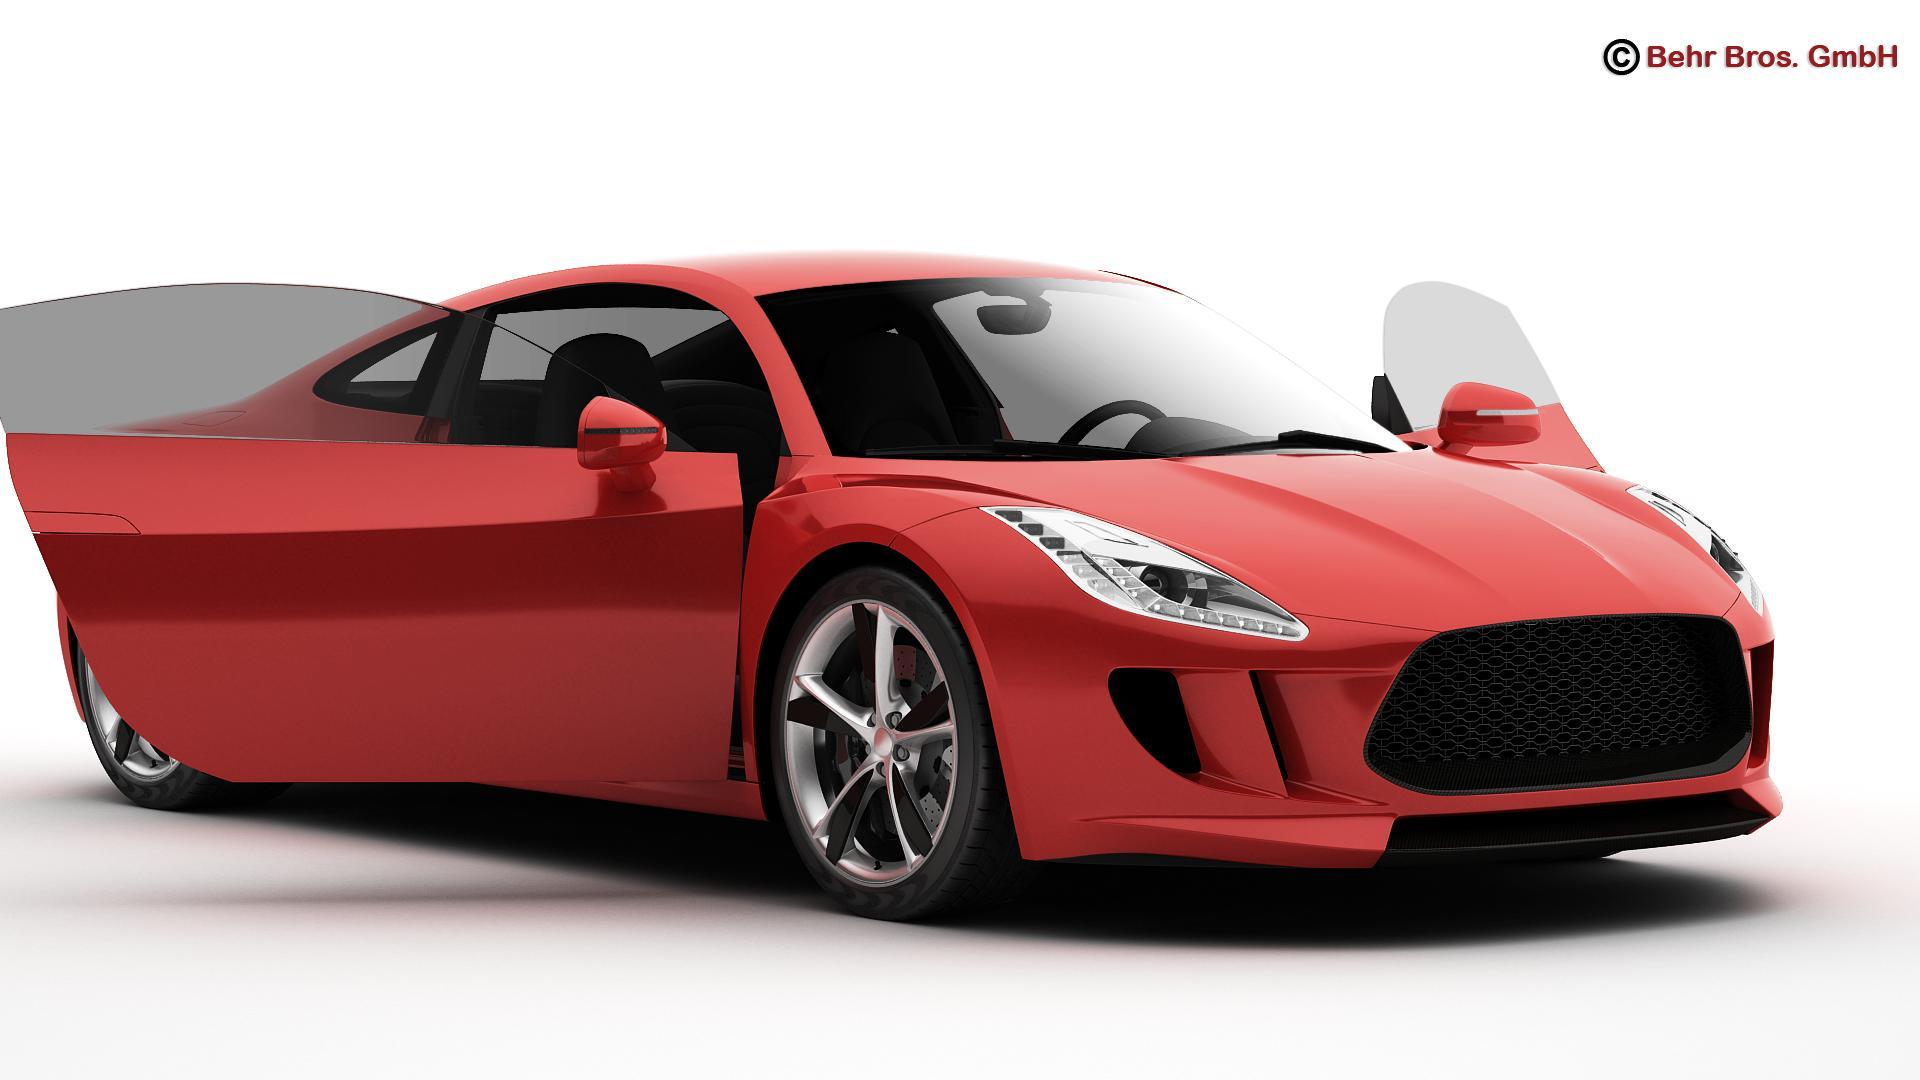 generic sports car 3d model 3ds max fbx c4d lwo ma mb obj 160519